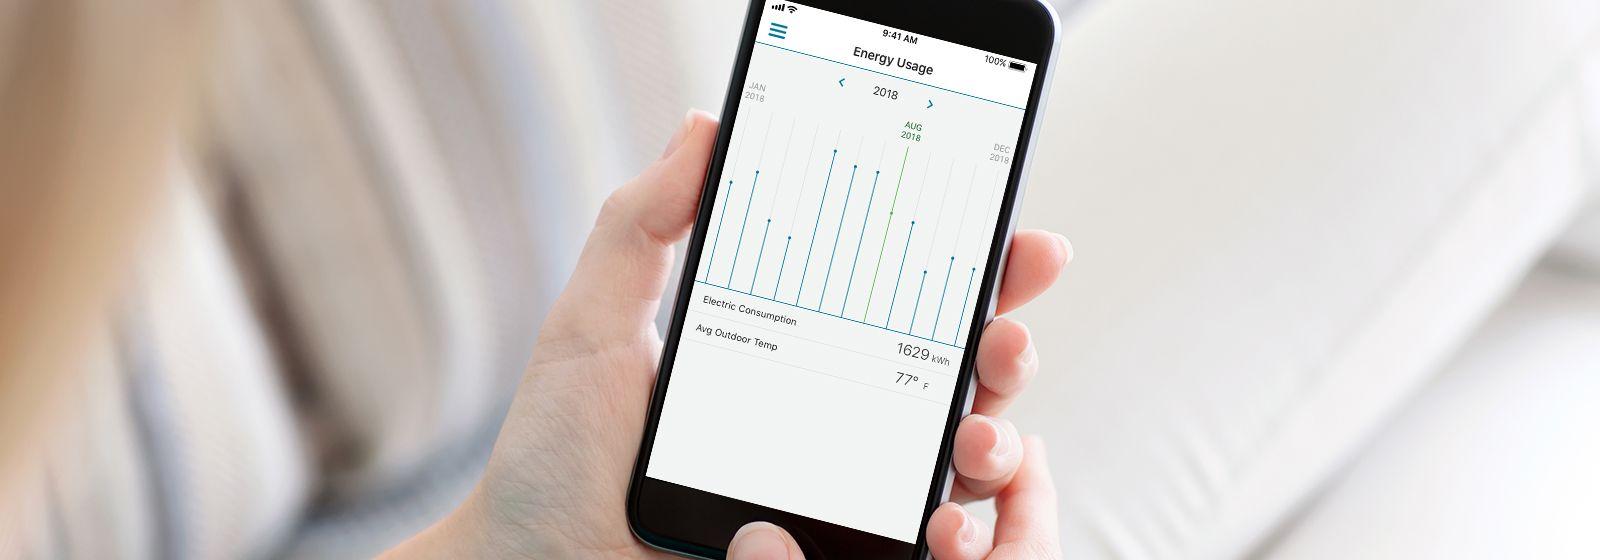 Pay Your Bill And More With Duke Energy S New Customer App Duke Energy Illumination